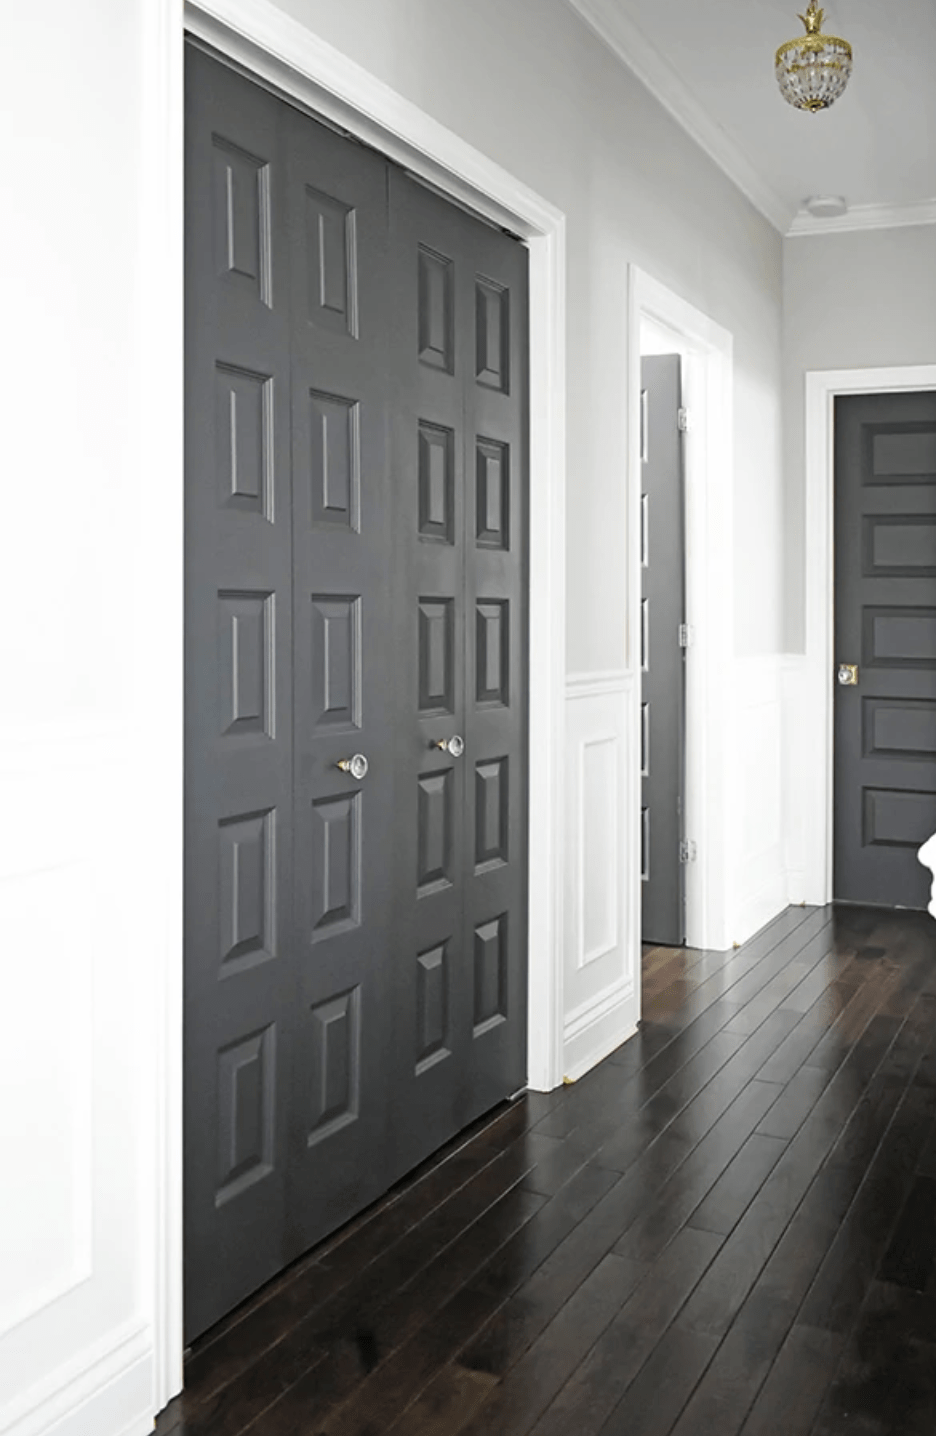 Dark painted doors in a bright hallway